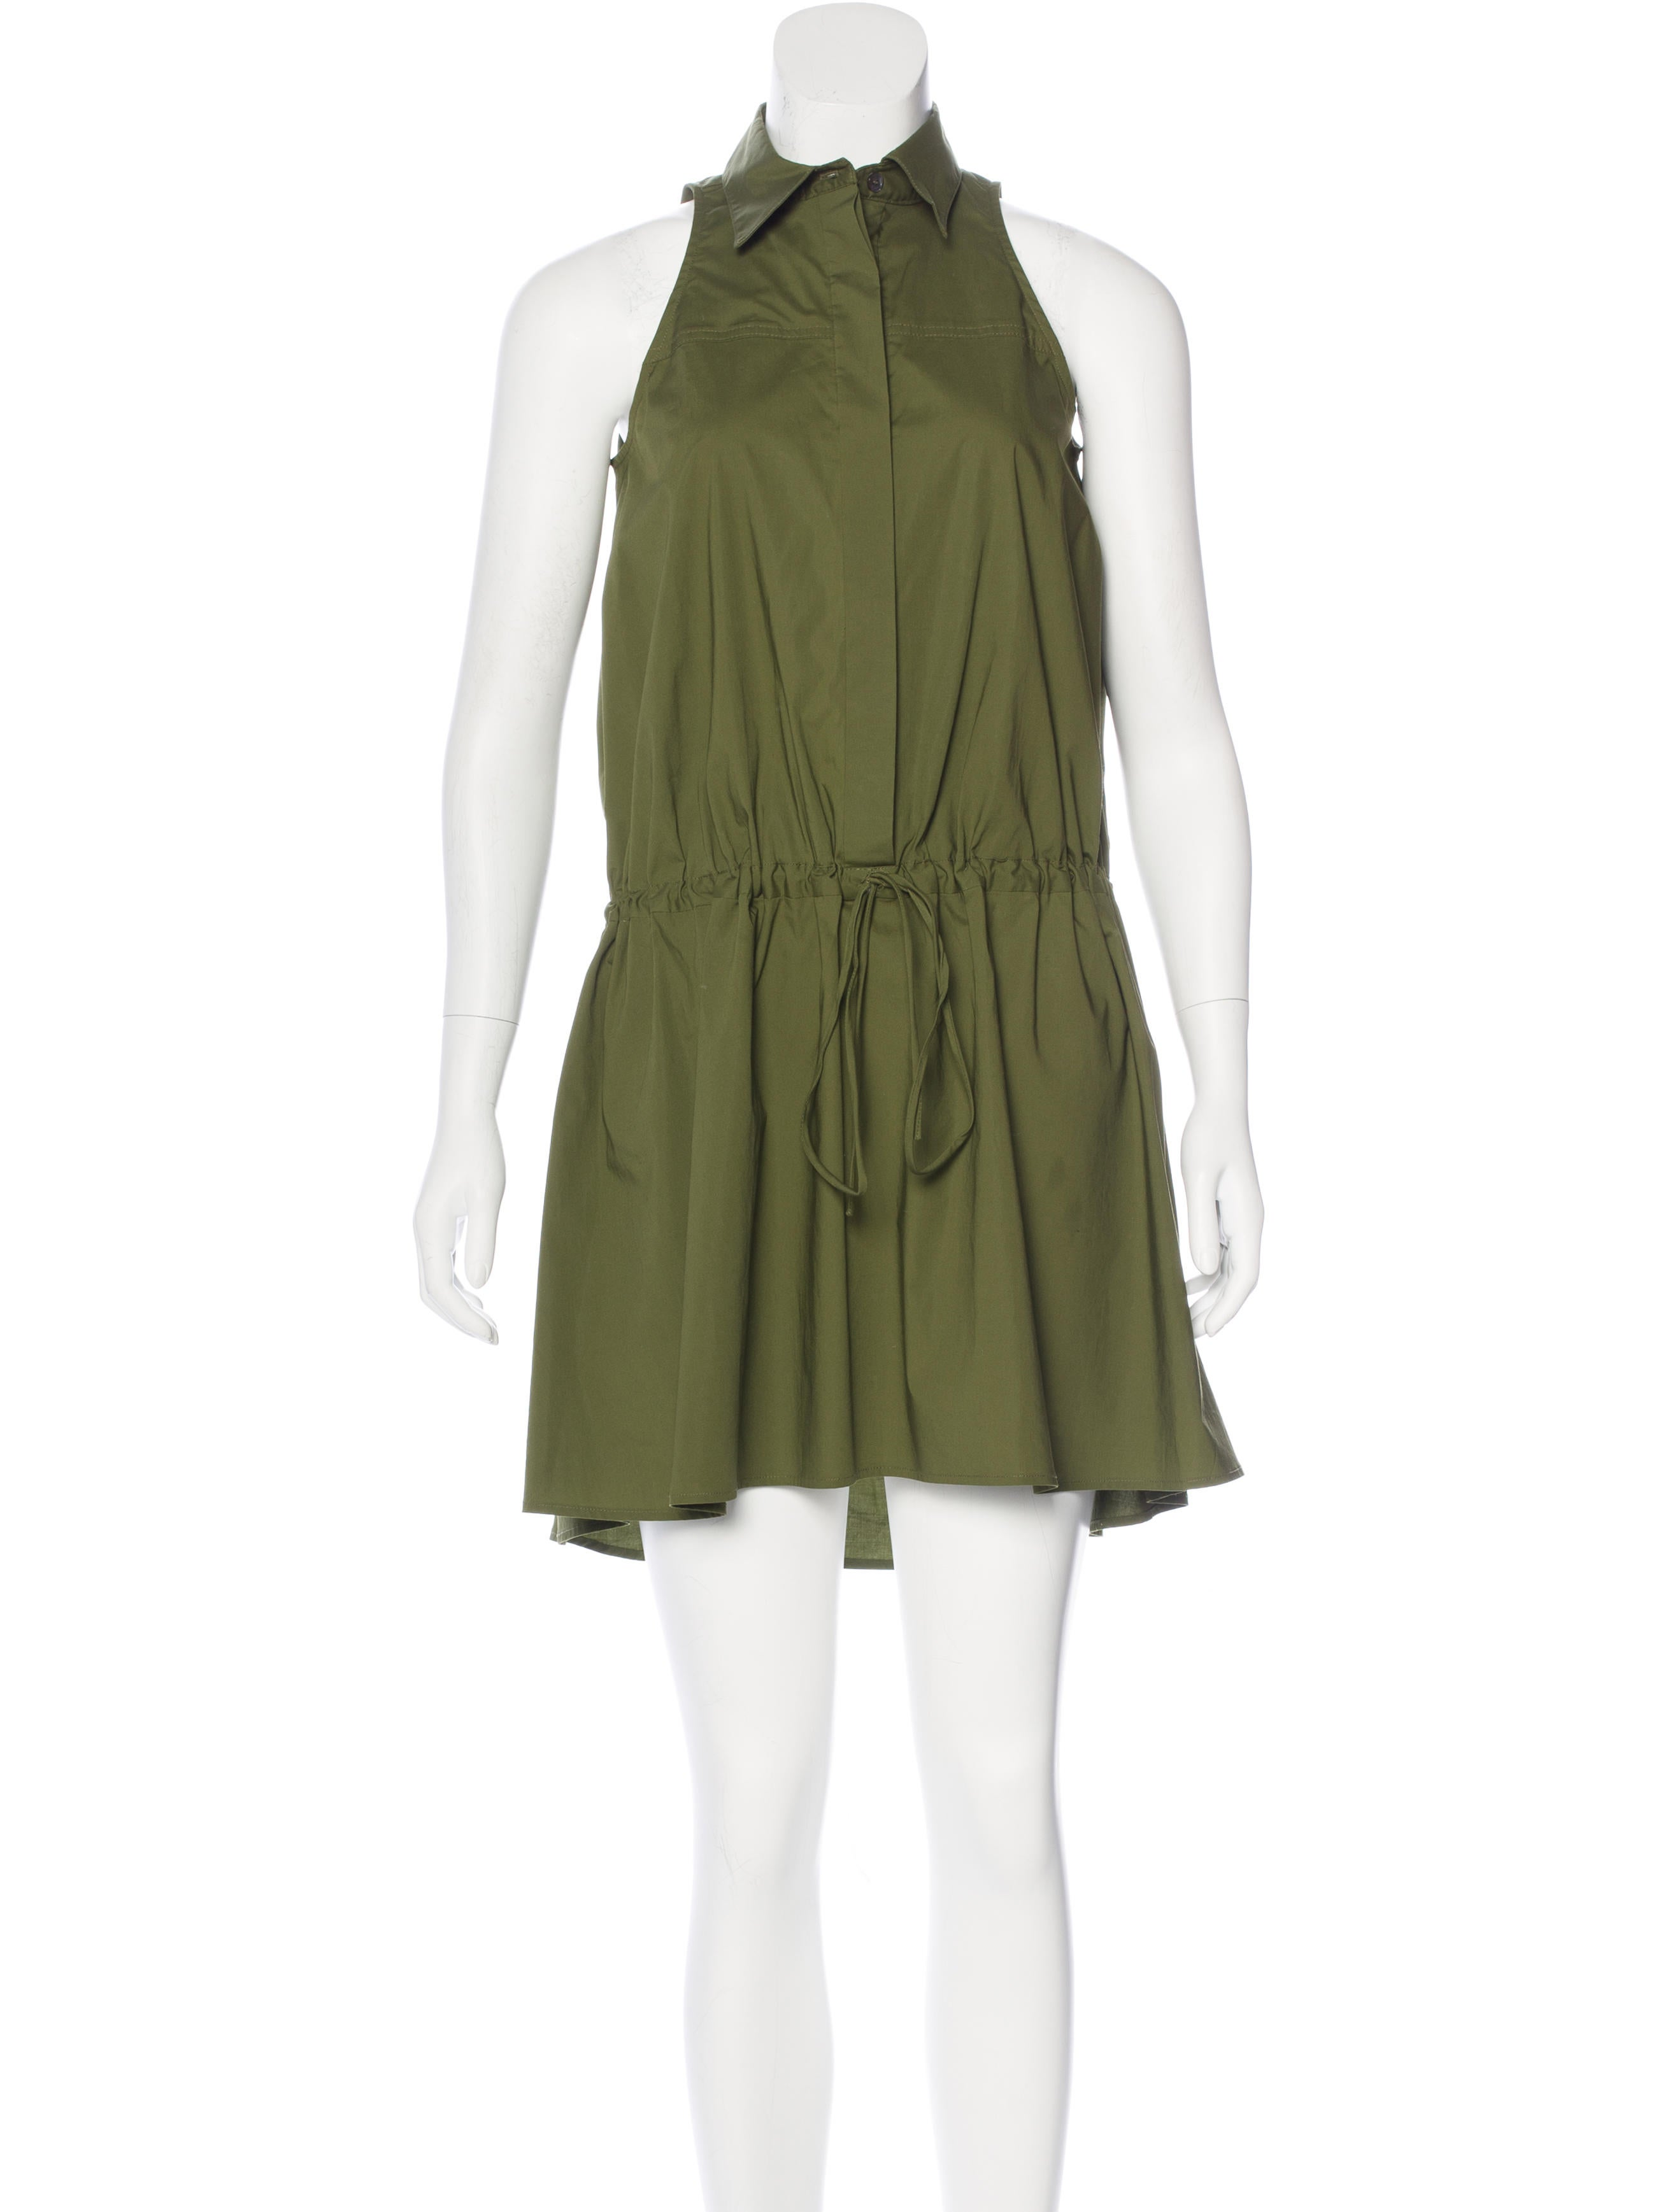 Derek Lam 10 Crosby Sleeveless Collar Dress Clothing